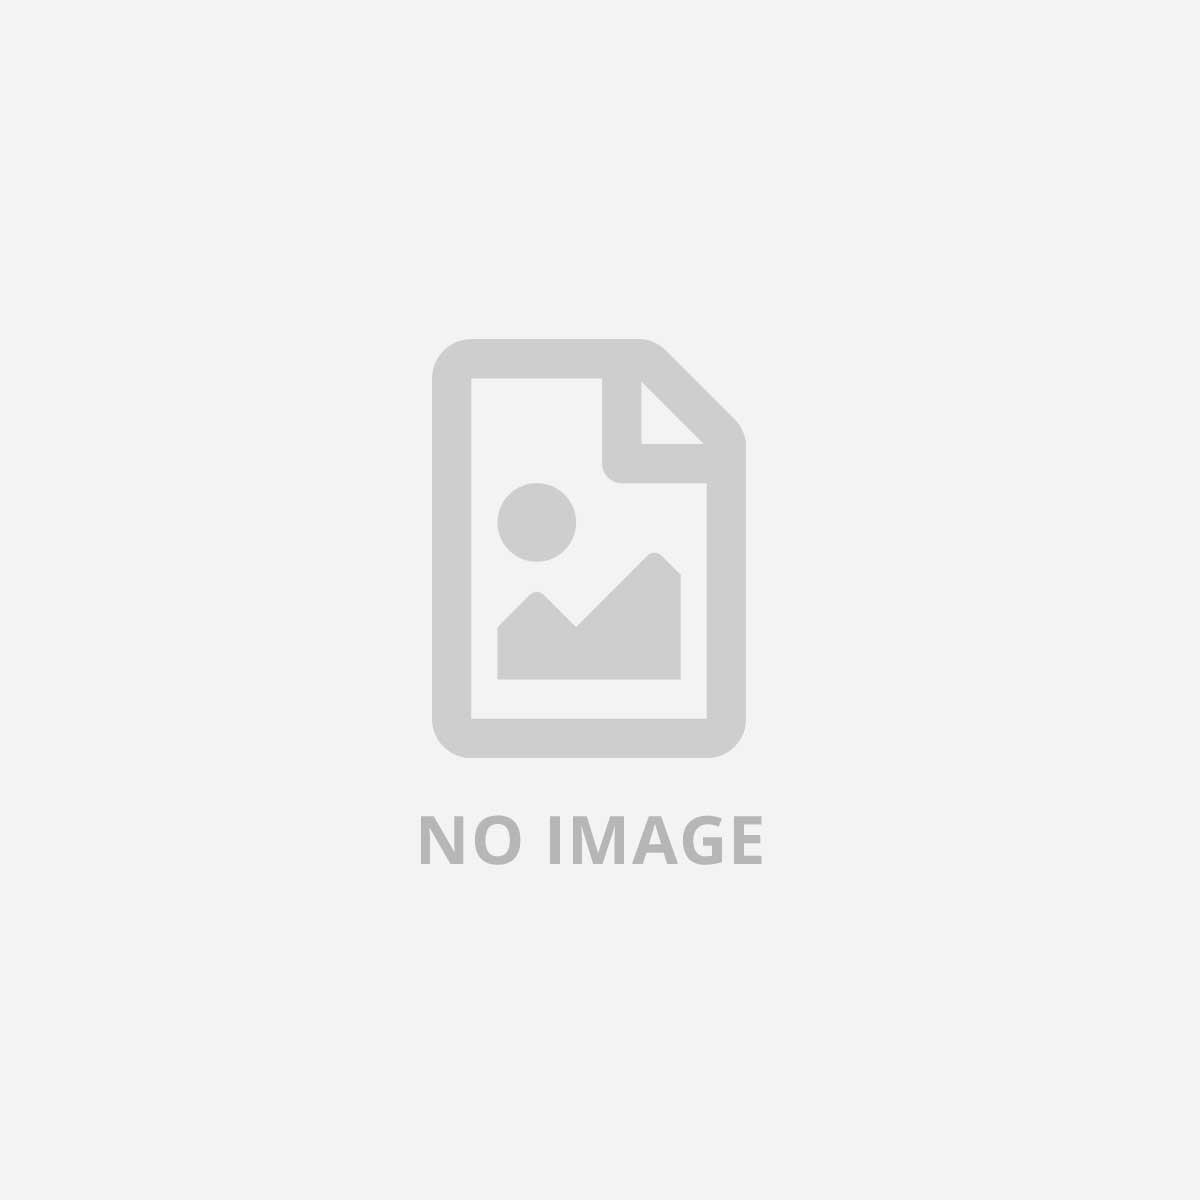 CANON GREETING CARD PACK 10X15 - 10 FOGLI